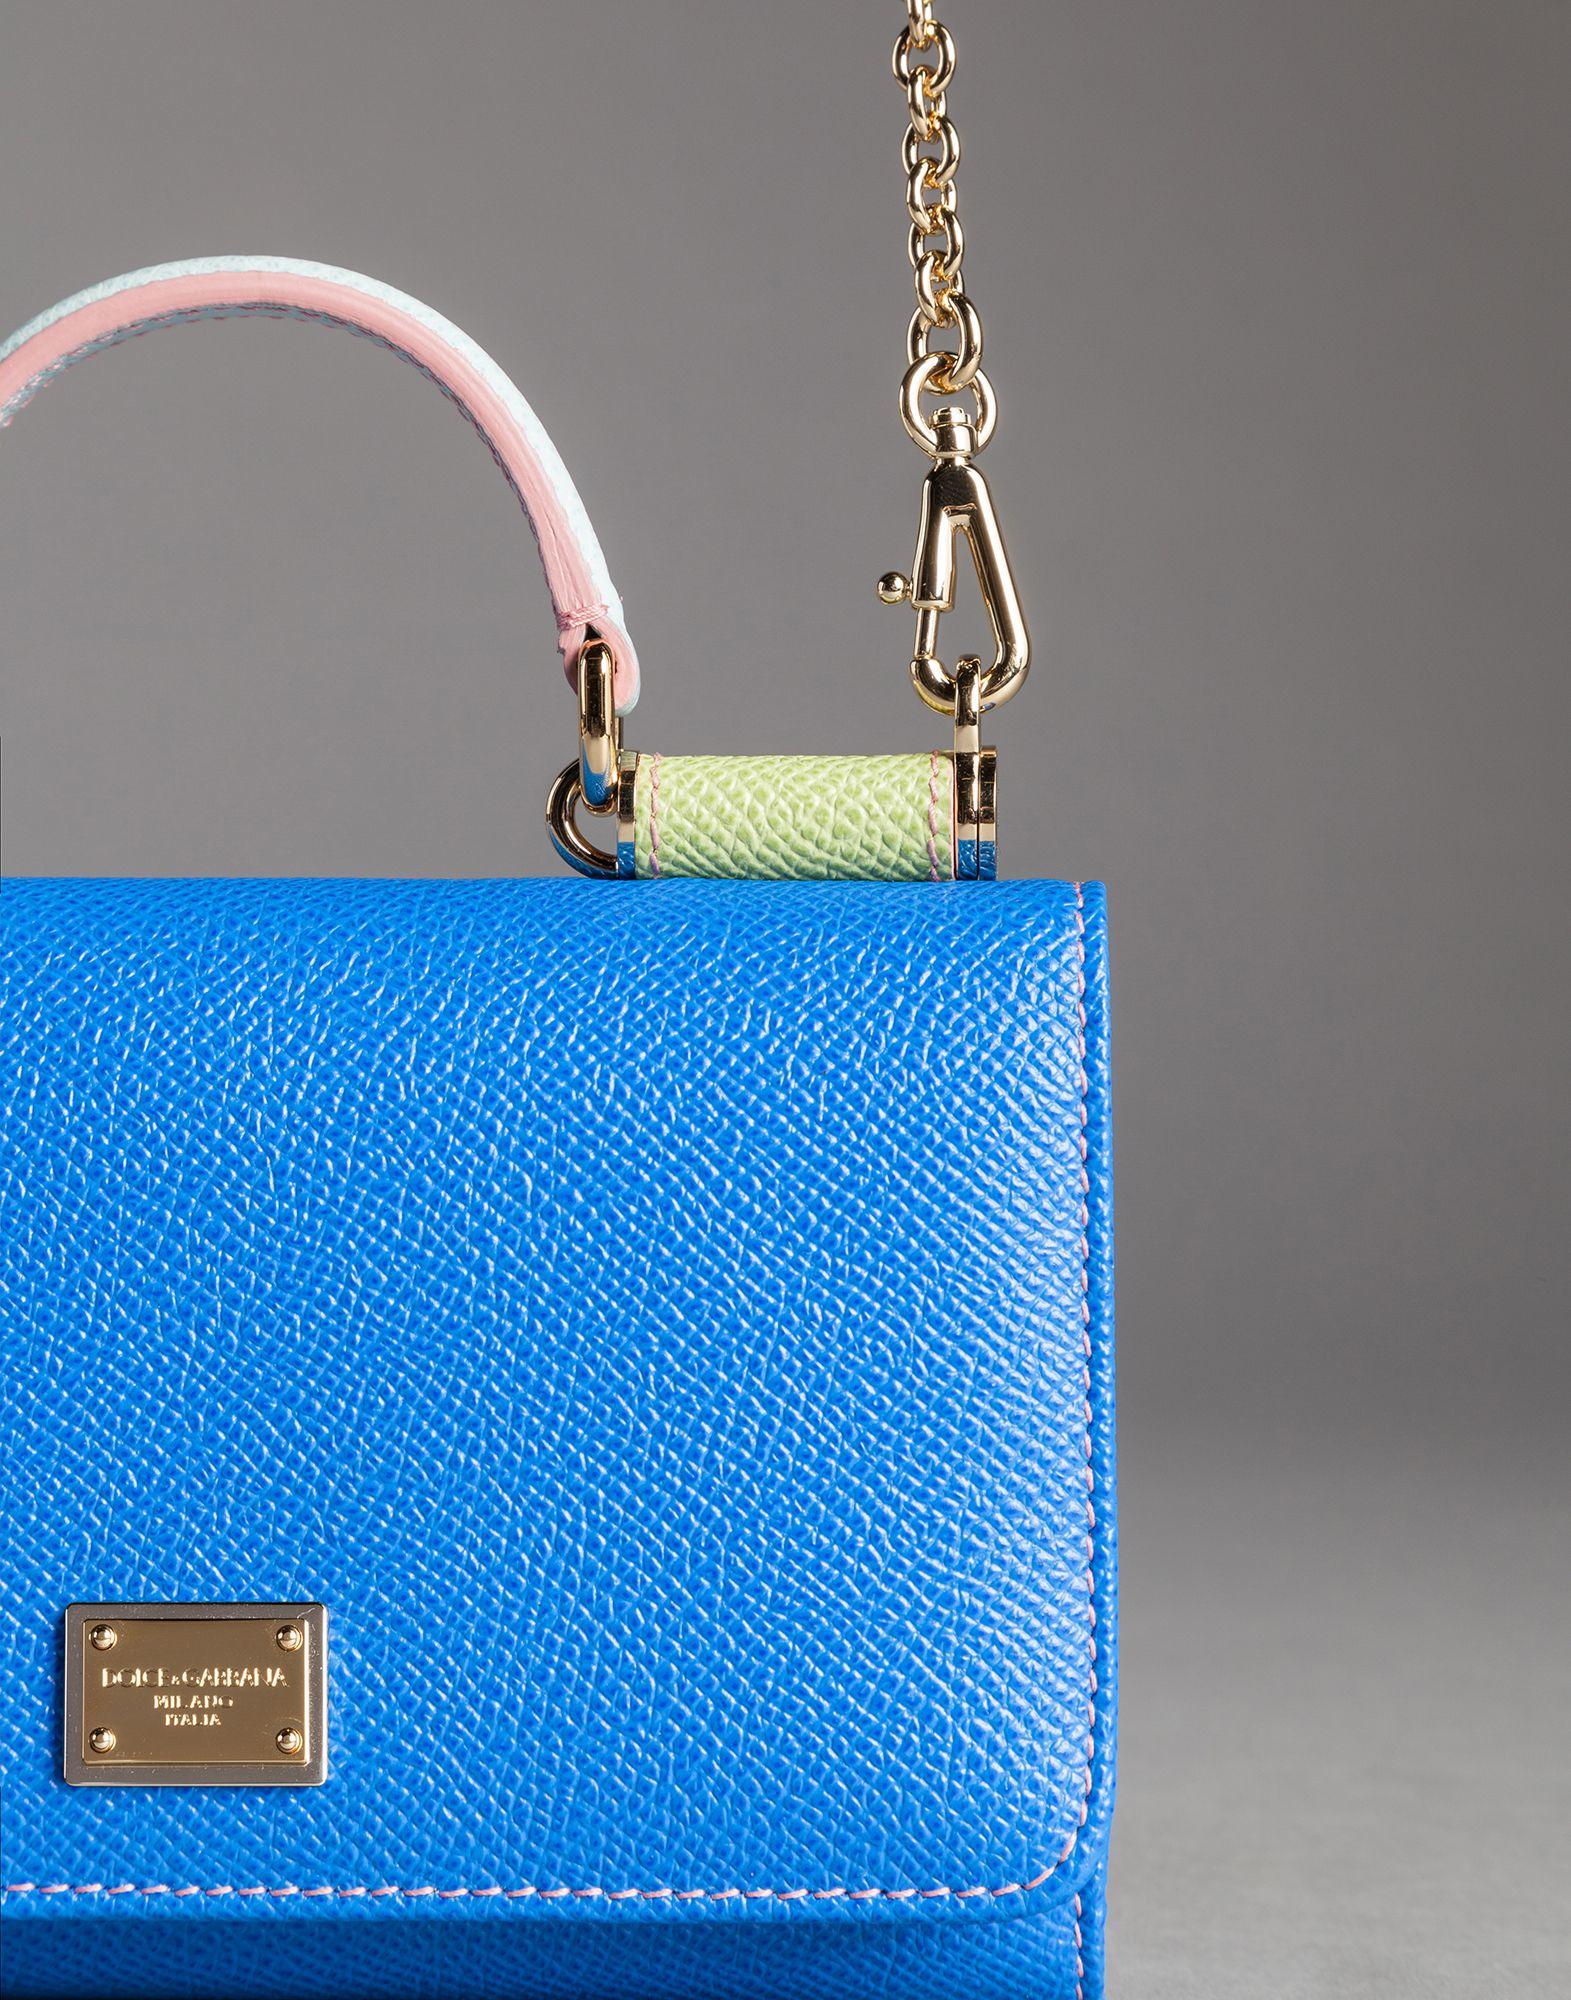 a0e6f8428d Lyst - Dolce   Gabbana Mini Von Bag Mix Limited Edition in Blue